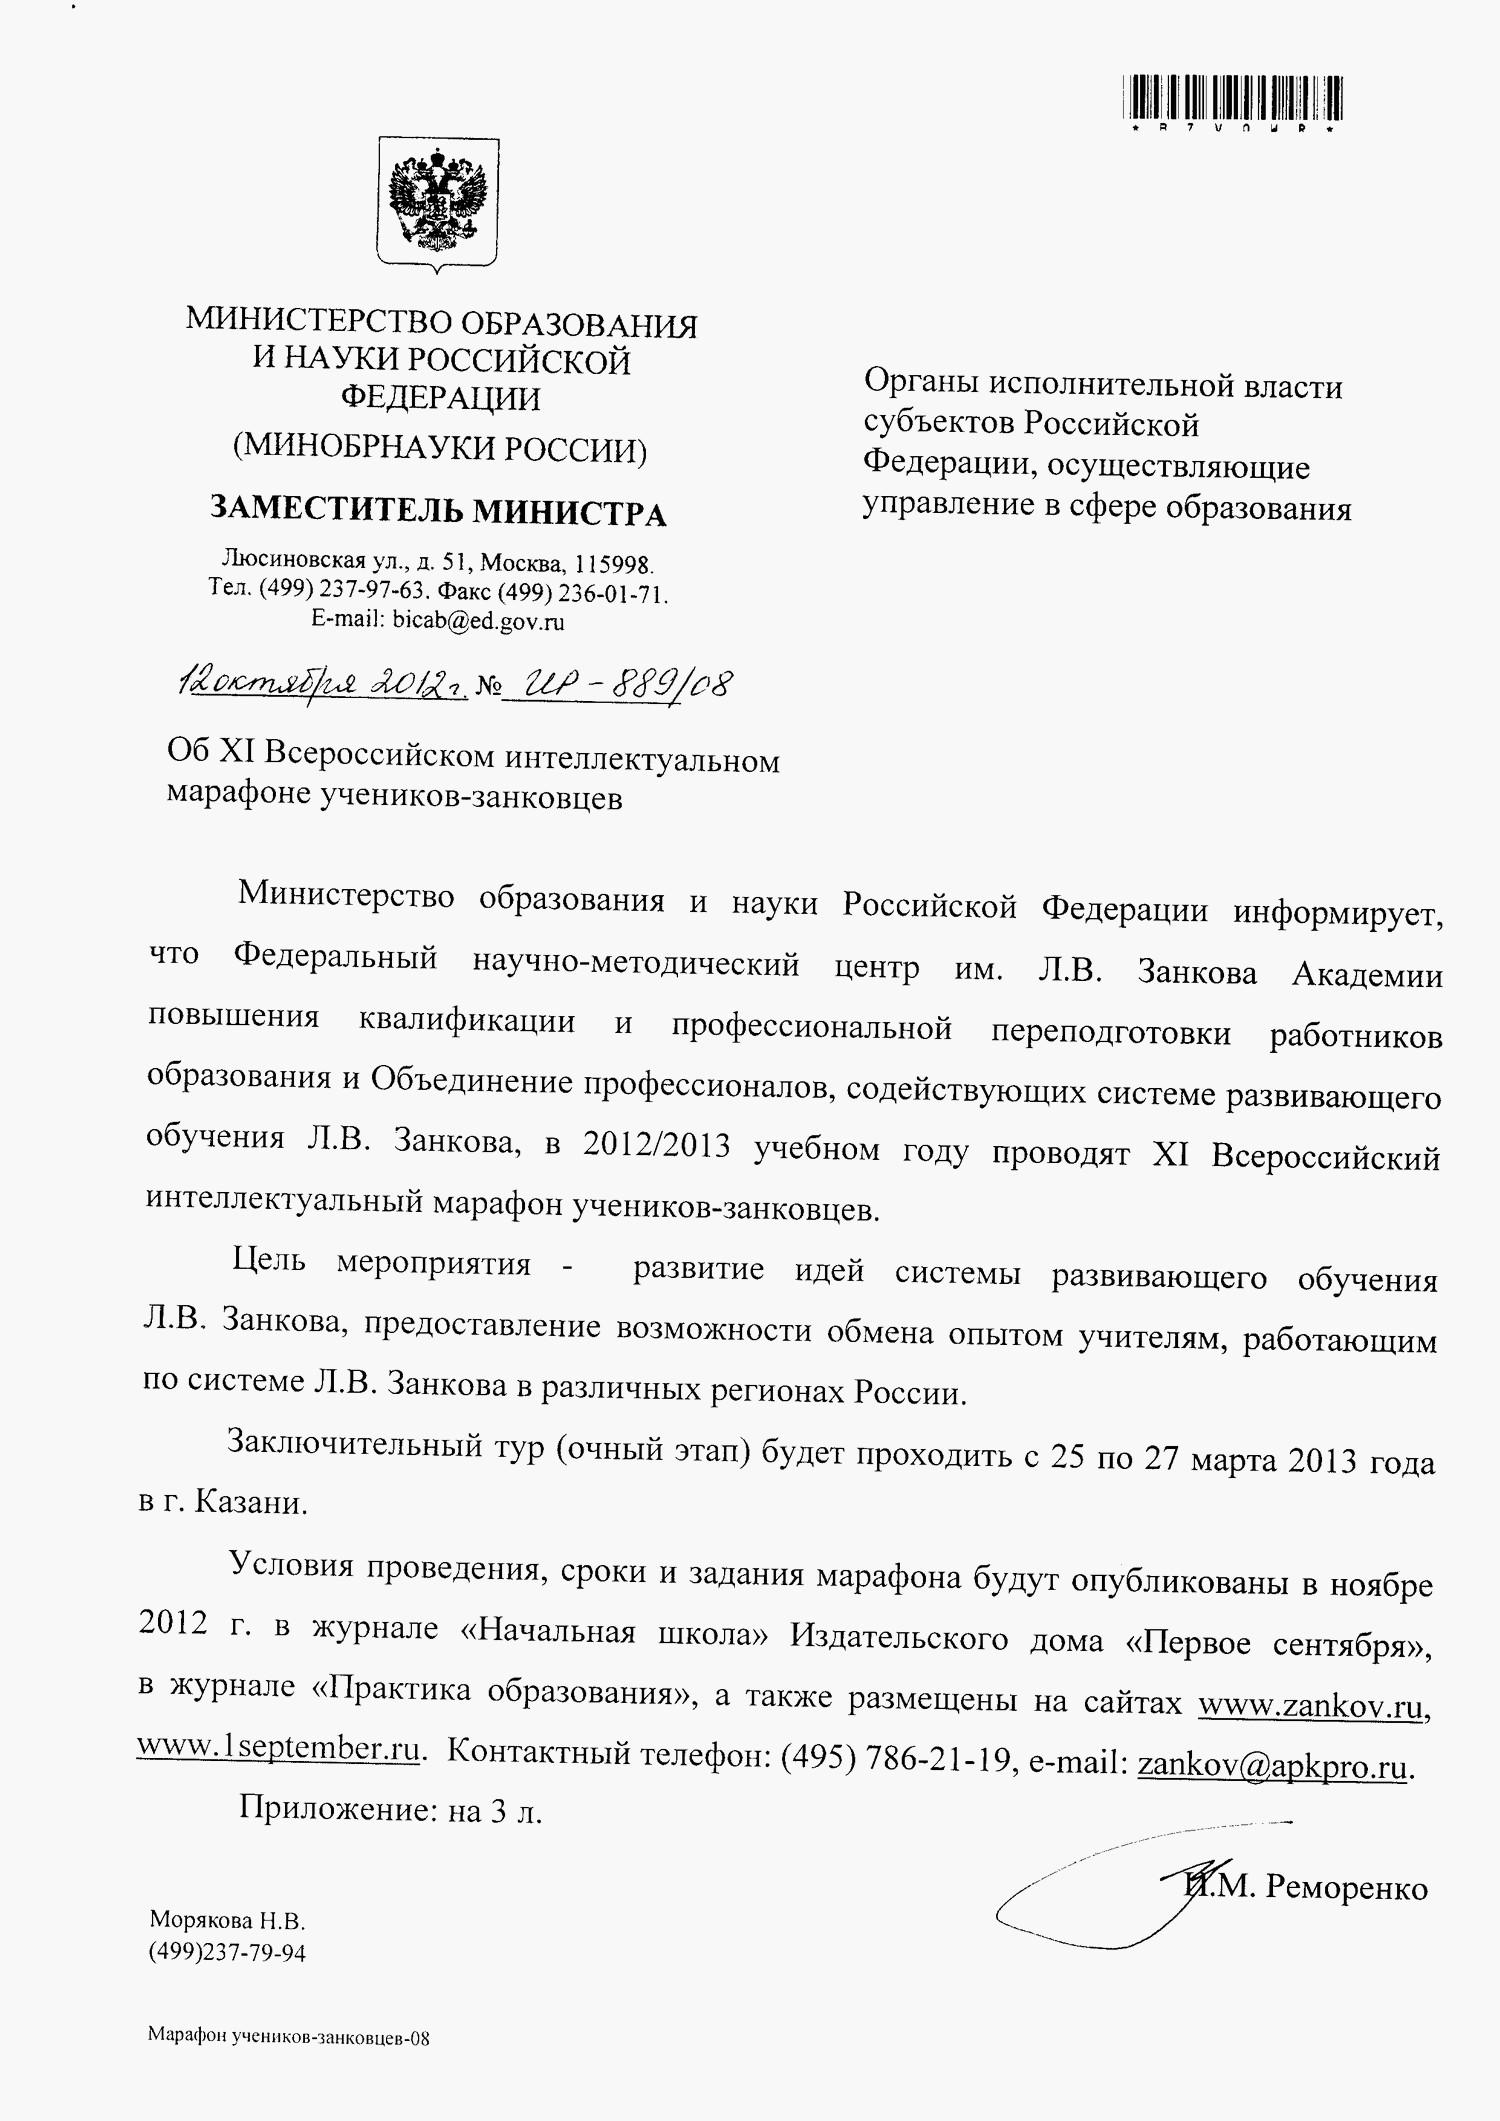 C 2002 20132003 учебного года фнмц им лв занкова и объединение профессионалов